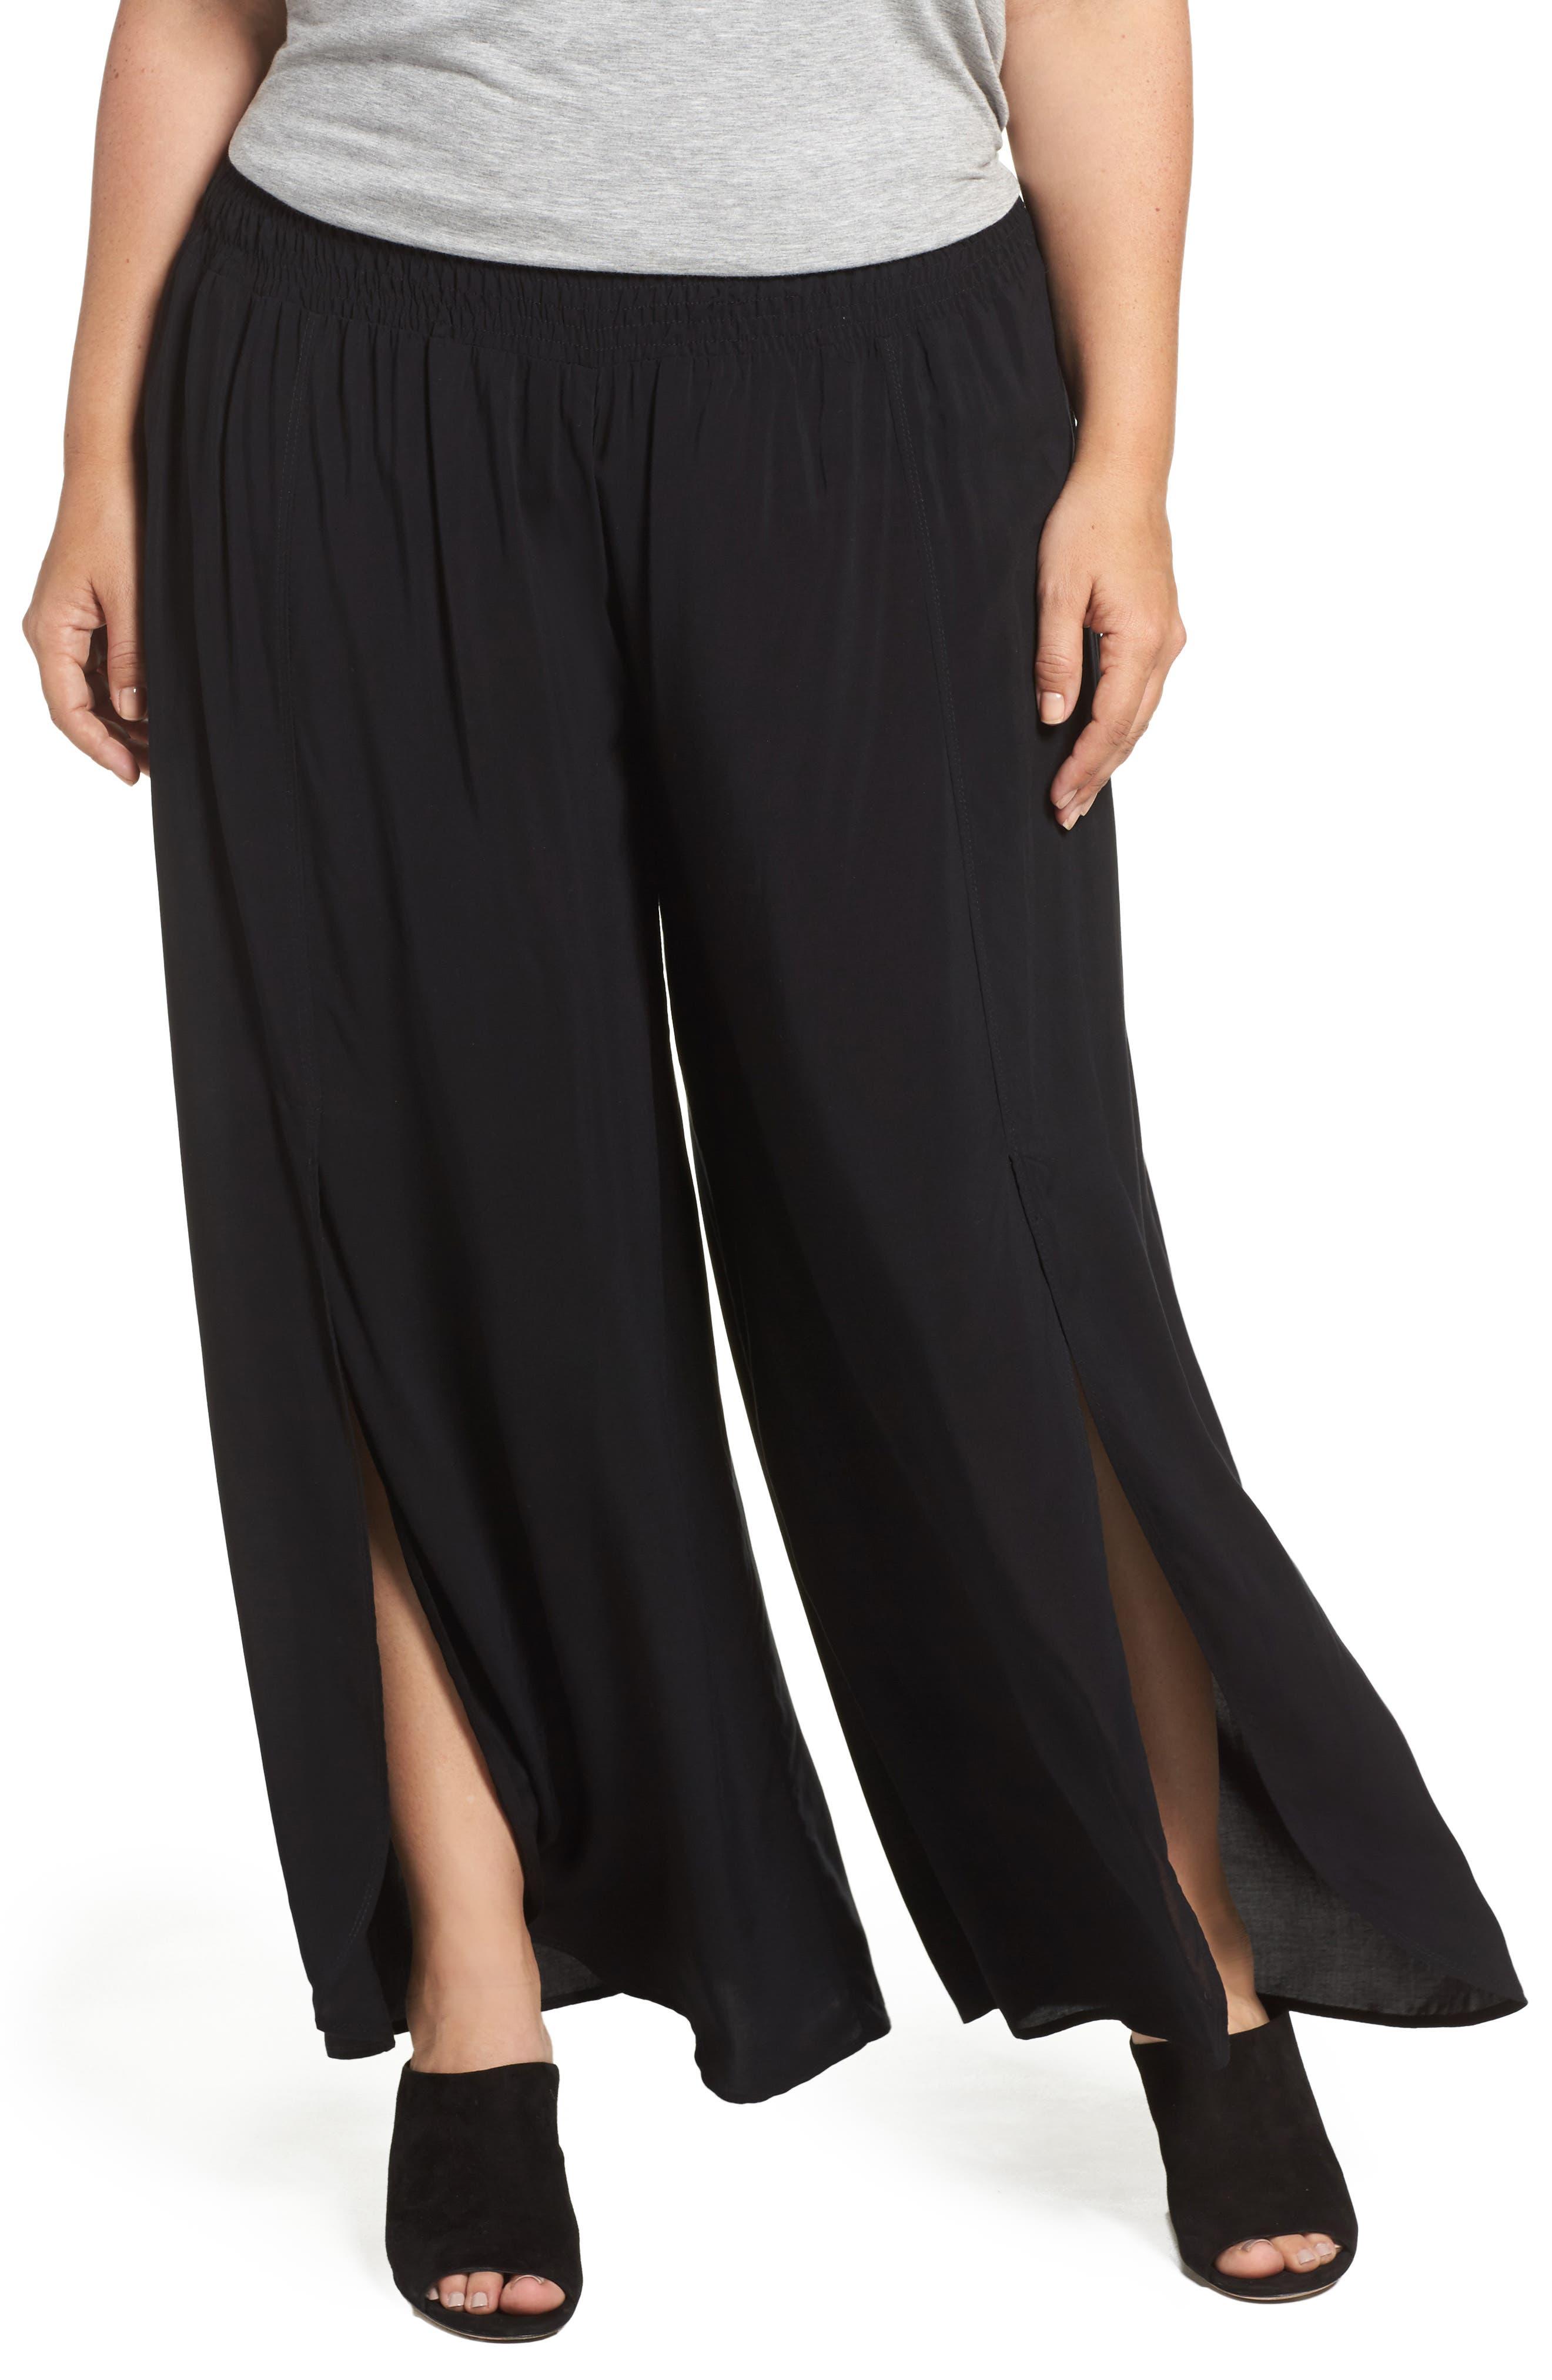 Alternate Image 1 Selected - Tart Nima Front Slit Pants (Plus Size)